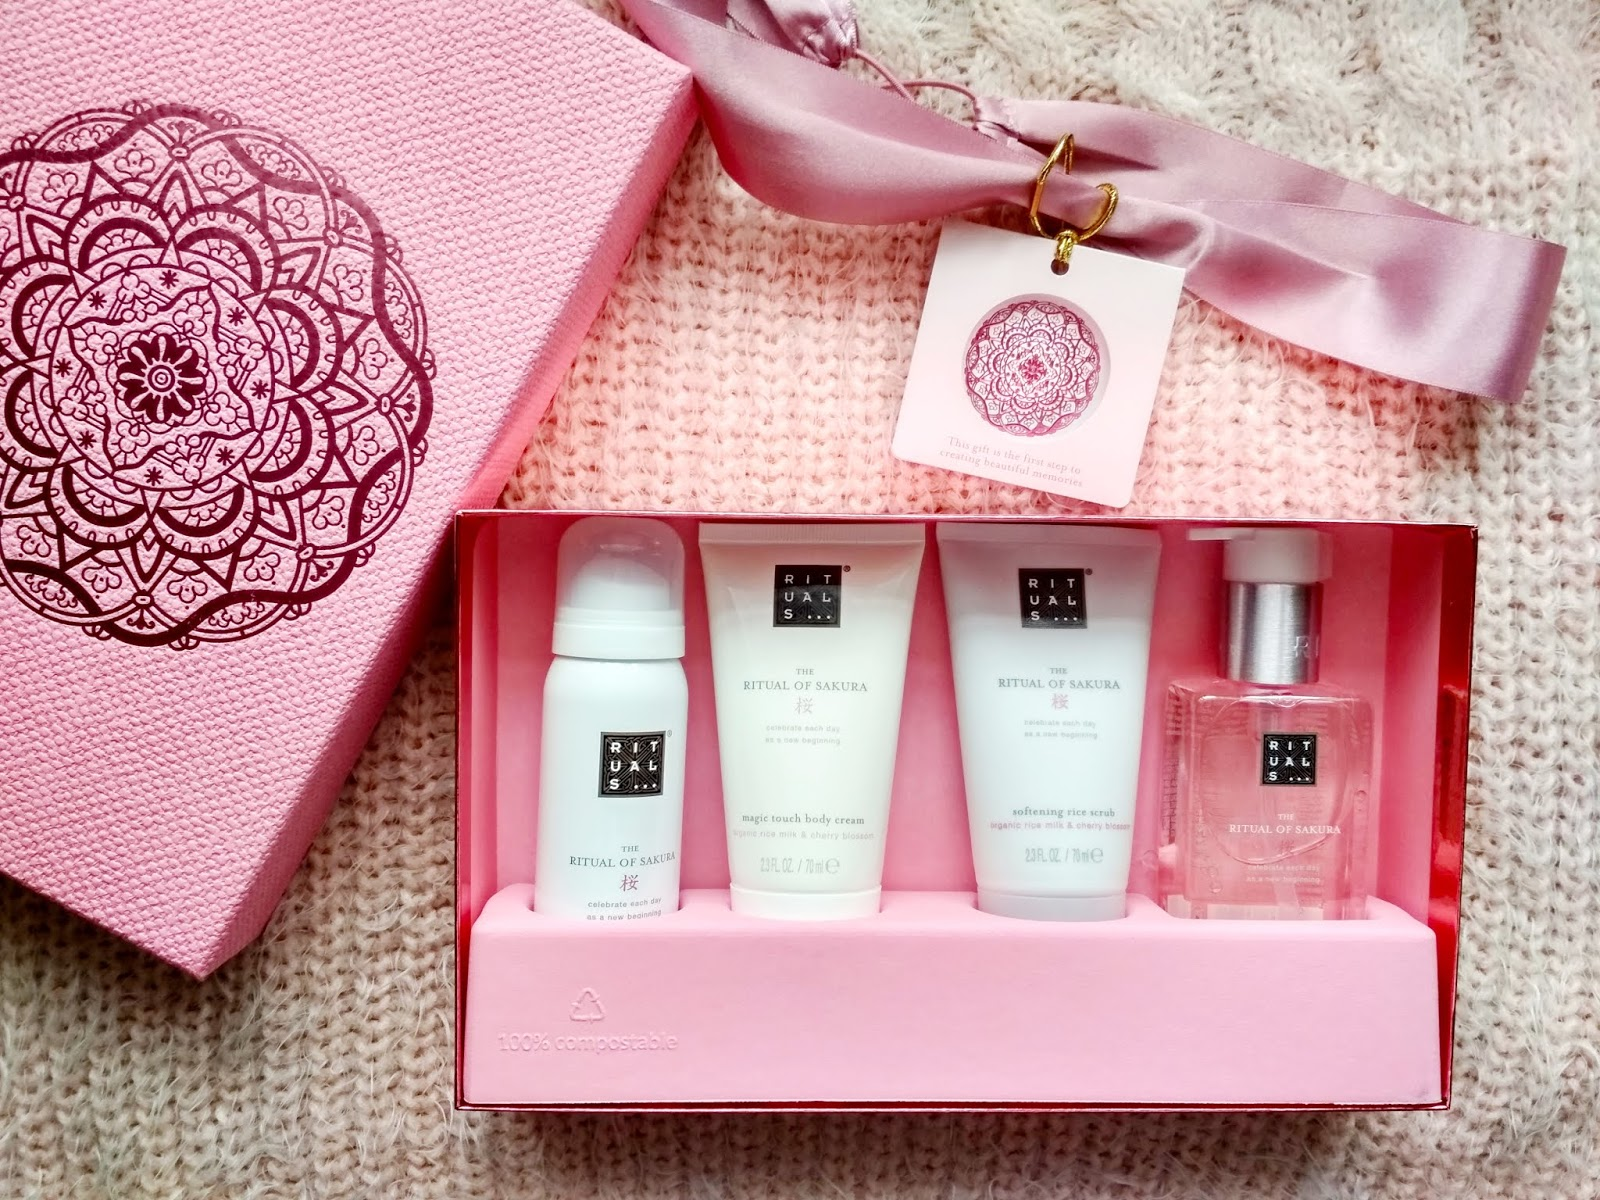 Recenzja - Rituals the Ritual of Sakura zestaw prezentowy